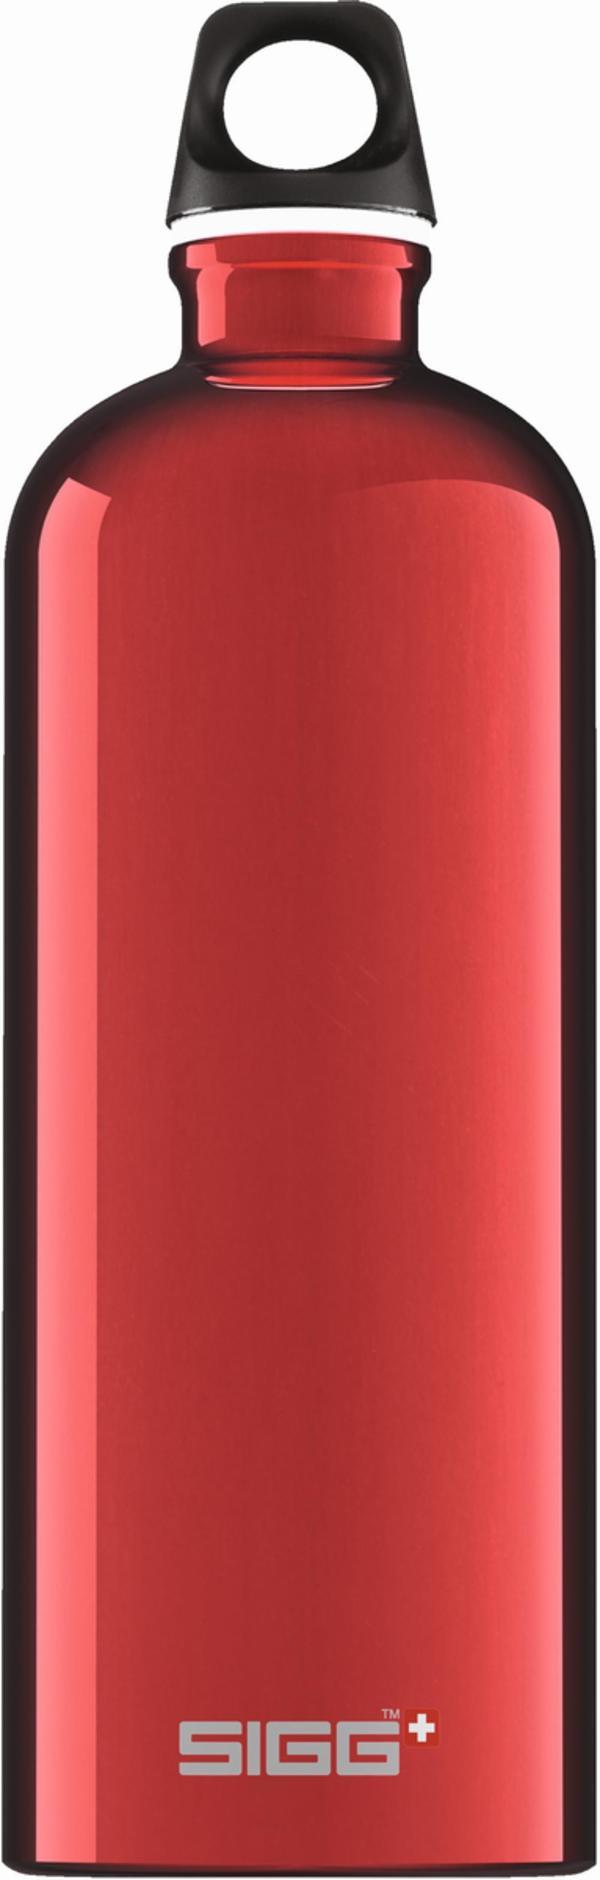 SIGG Trinkflasche Alu Traveller Red 1l